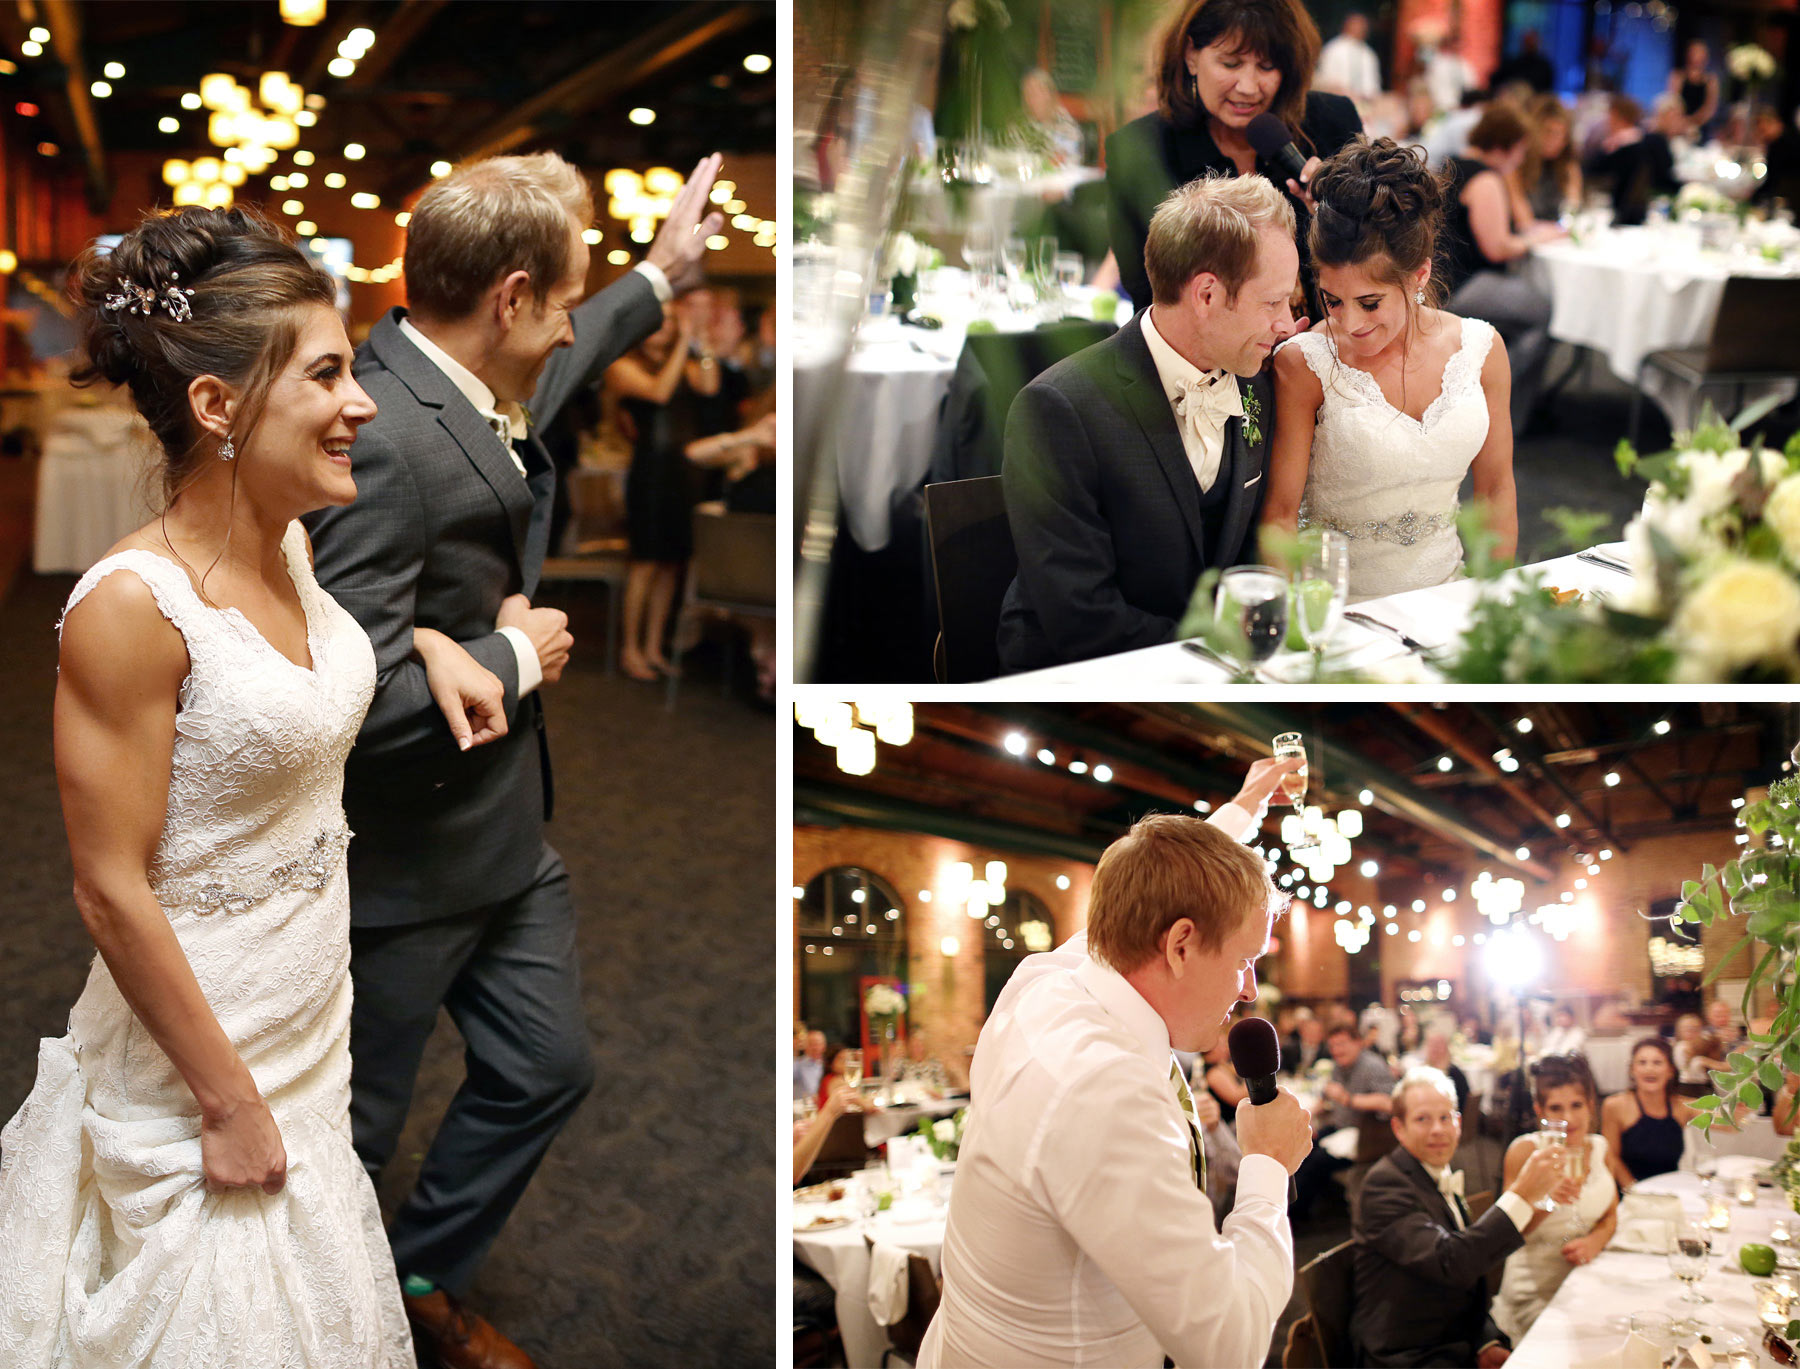 23-Minneapolis-Minnesota-Wedding-Photographer-by-Andrew-Vick-Photography-Fall-Autumn-Nicollet-Island-Pavillion-Bride-Groom-Grand-March-Prayer-Speeches-Groomsmen-Paula-and-Jason.jpg